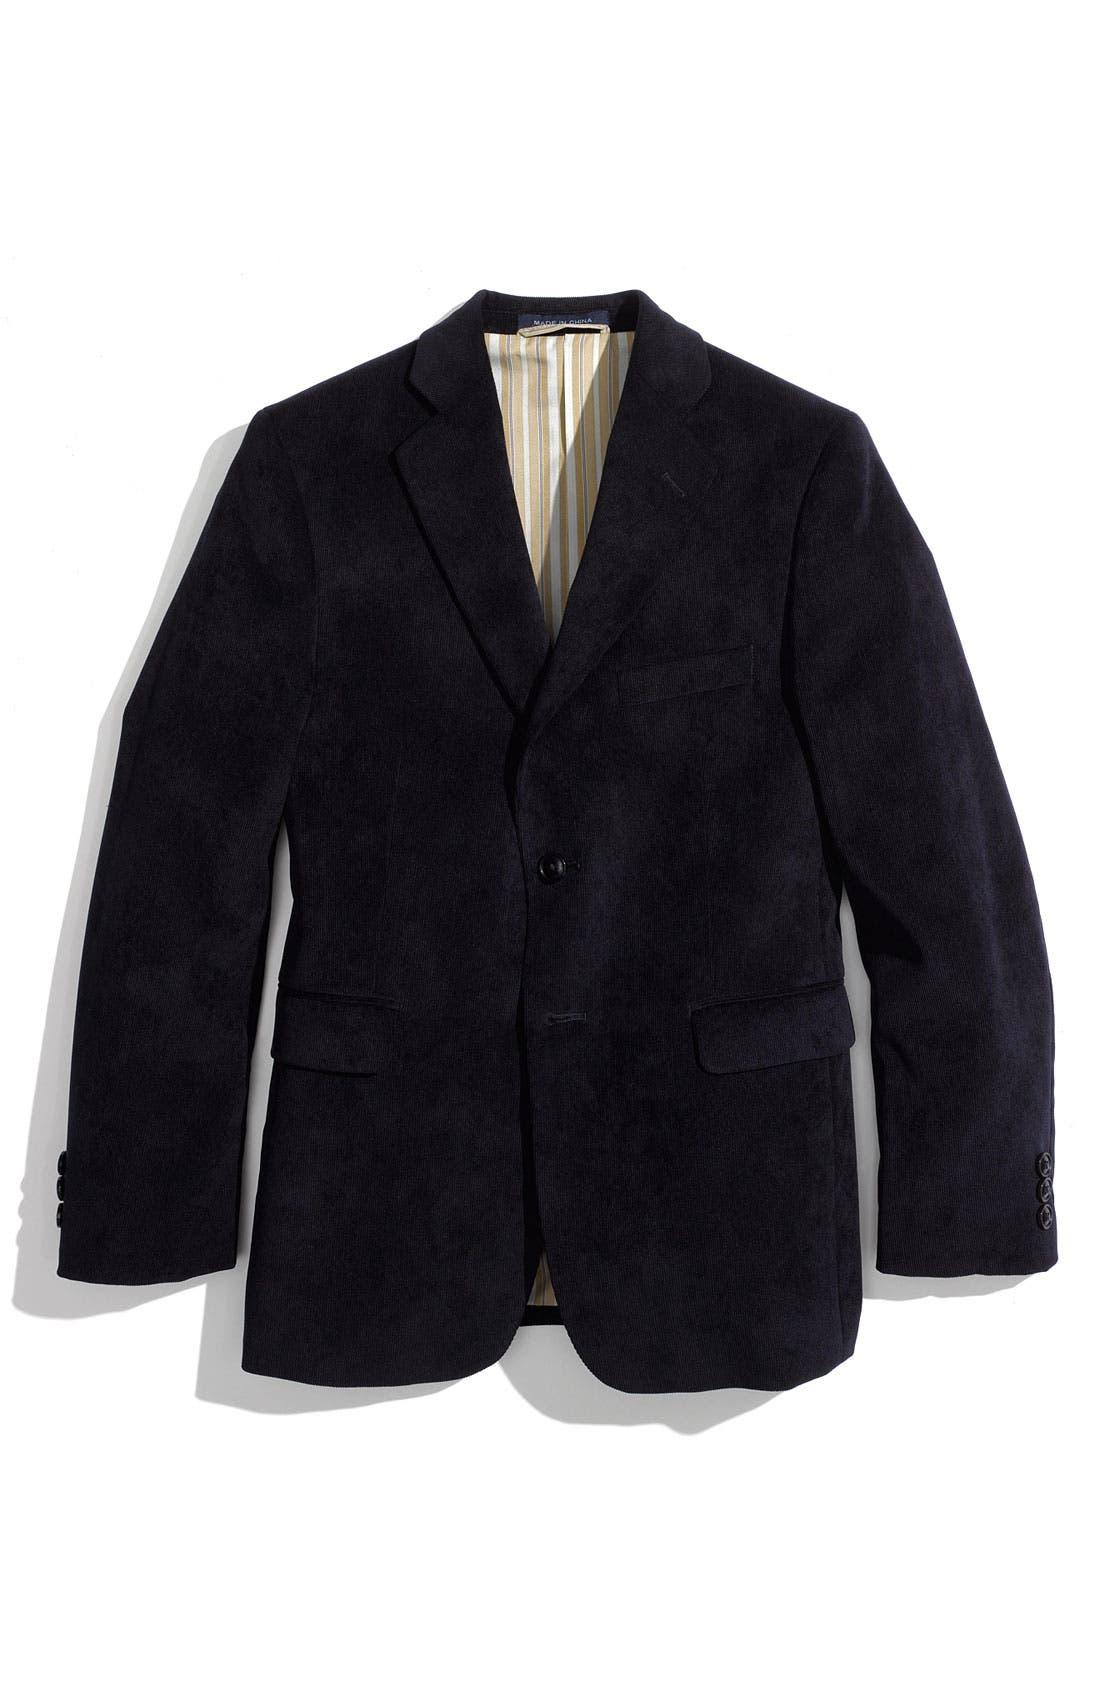 Alternate Image 1 Selected - Joseph Abboud Corduroy Sportcoat (Big Boys)